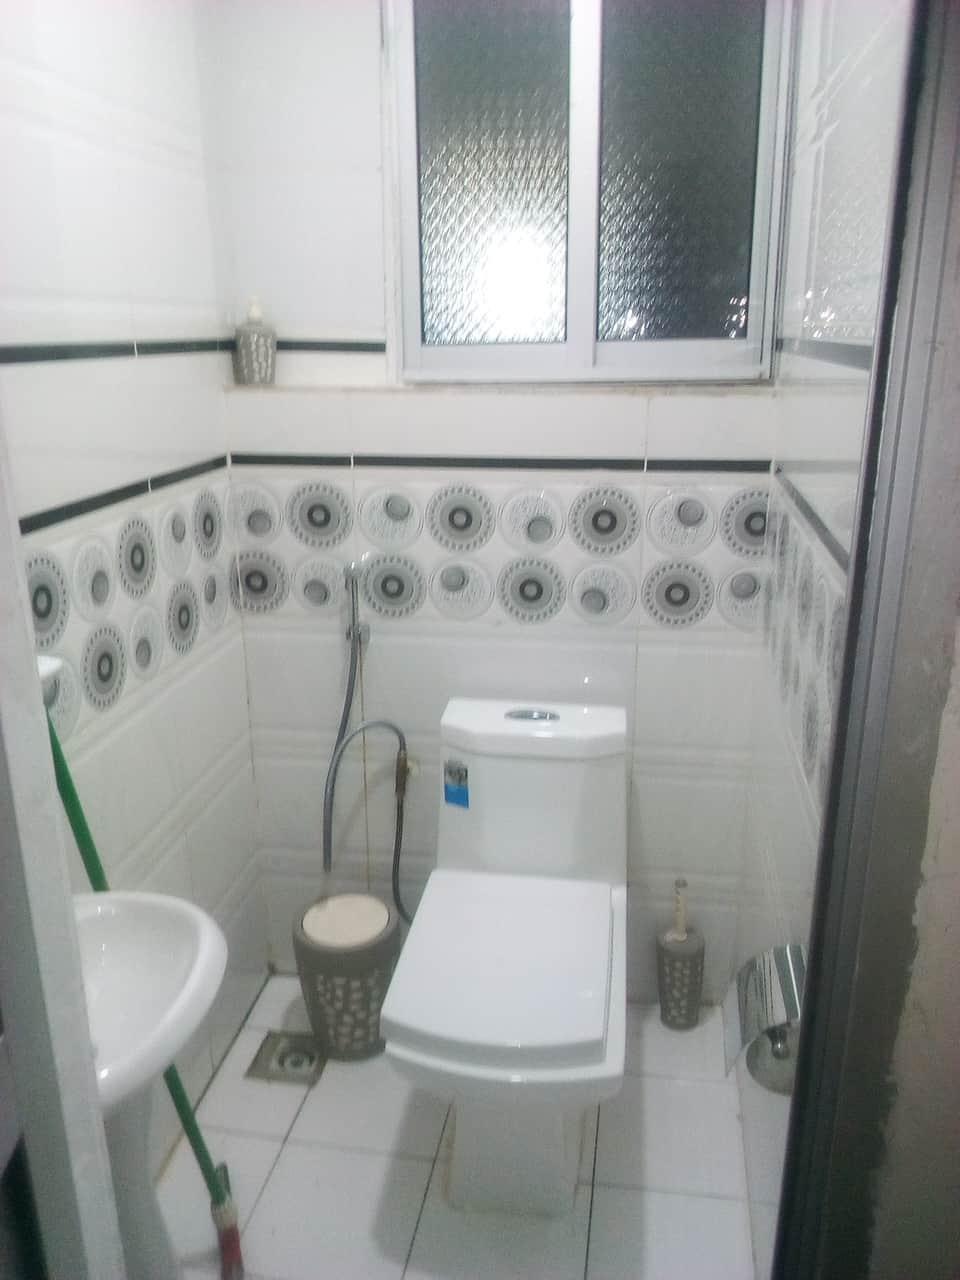 Apartment to rent - Yaoundé, Bastos, pas loin de meumi - 1 living room(s), 2 bedroom(s), 2 bathroom(s) - 800 000 FCFA / month